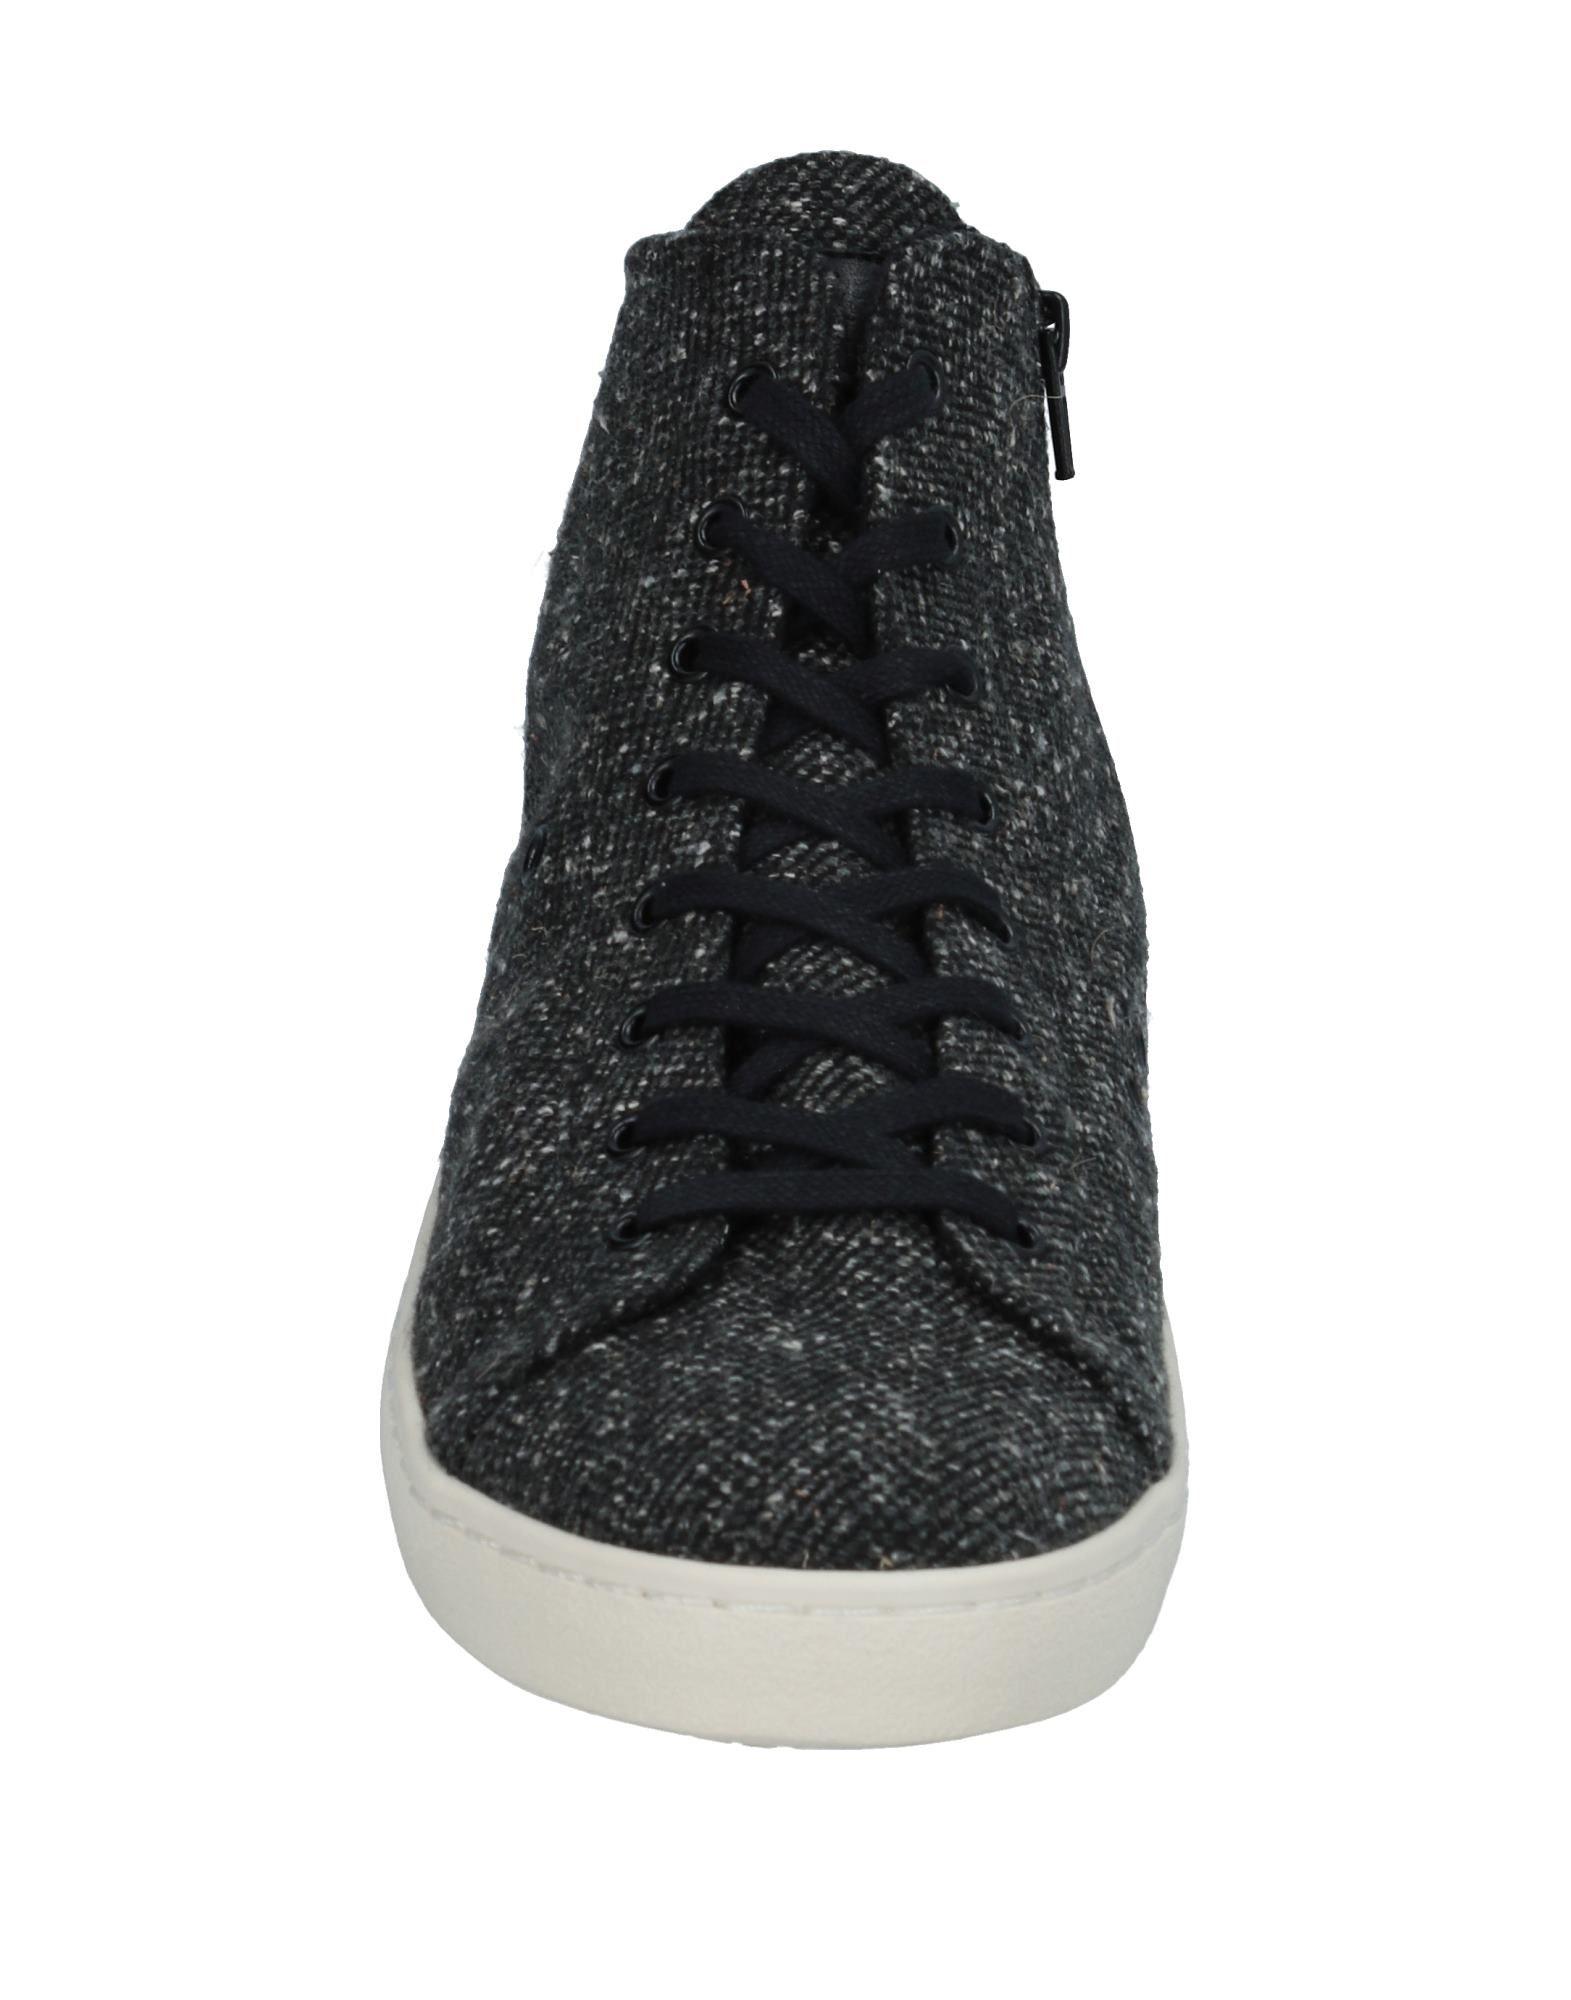 Leather Crown Sneakers - Men Men Men Leather Crown Sneakers online on  United Kingdom - 11528927AI 895090